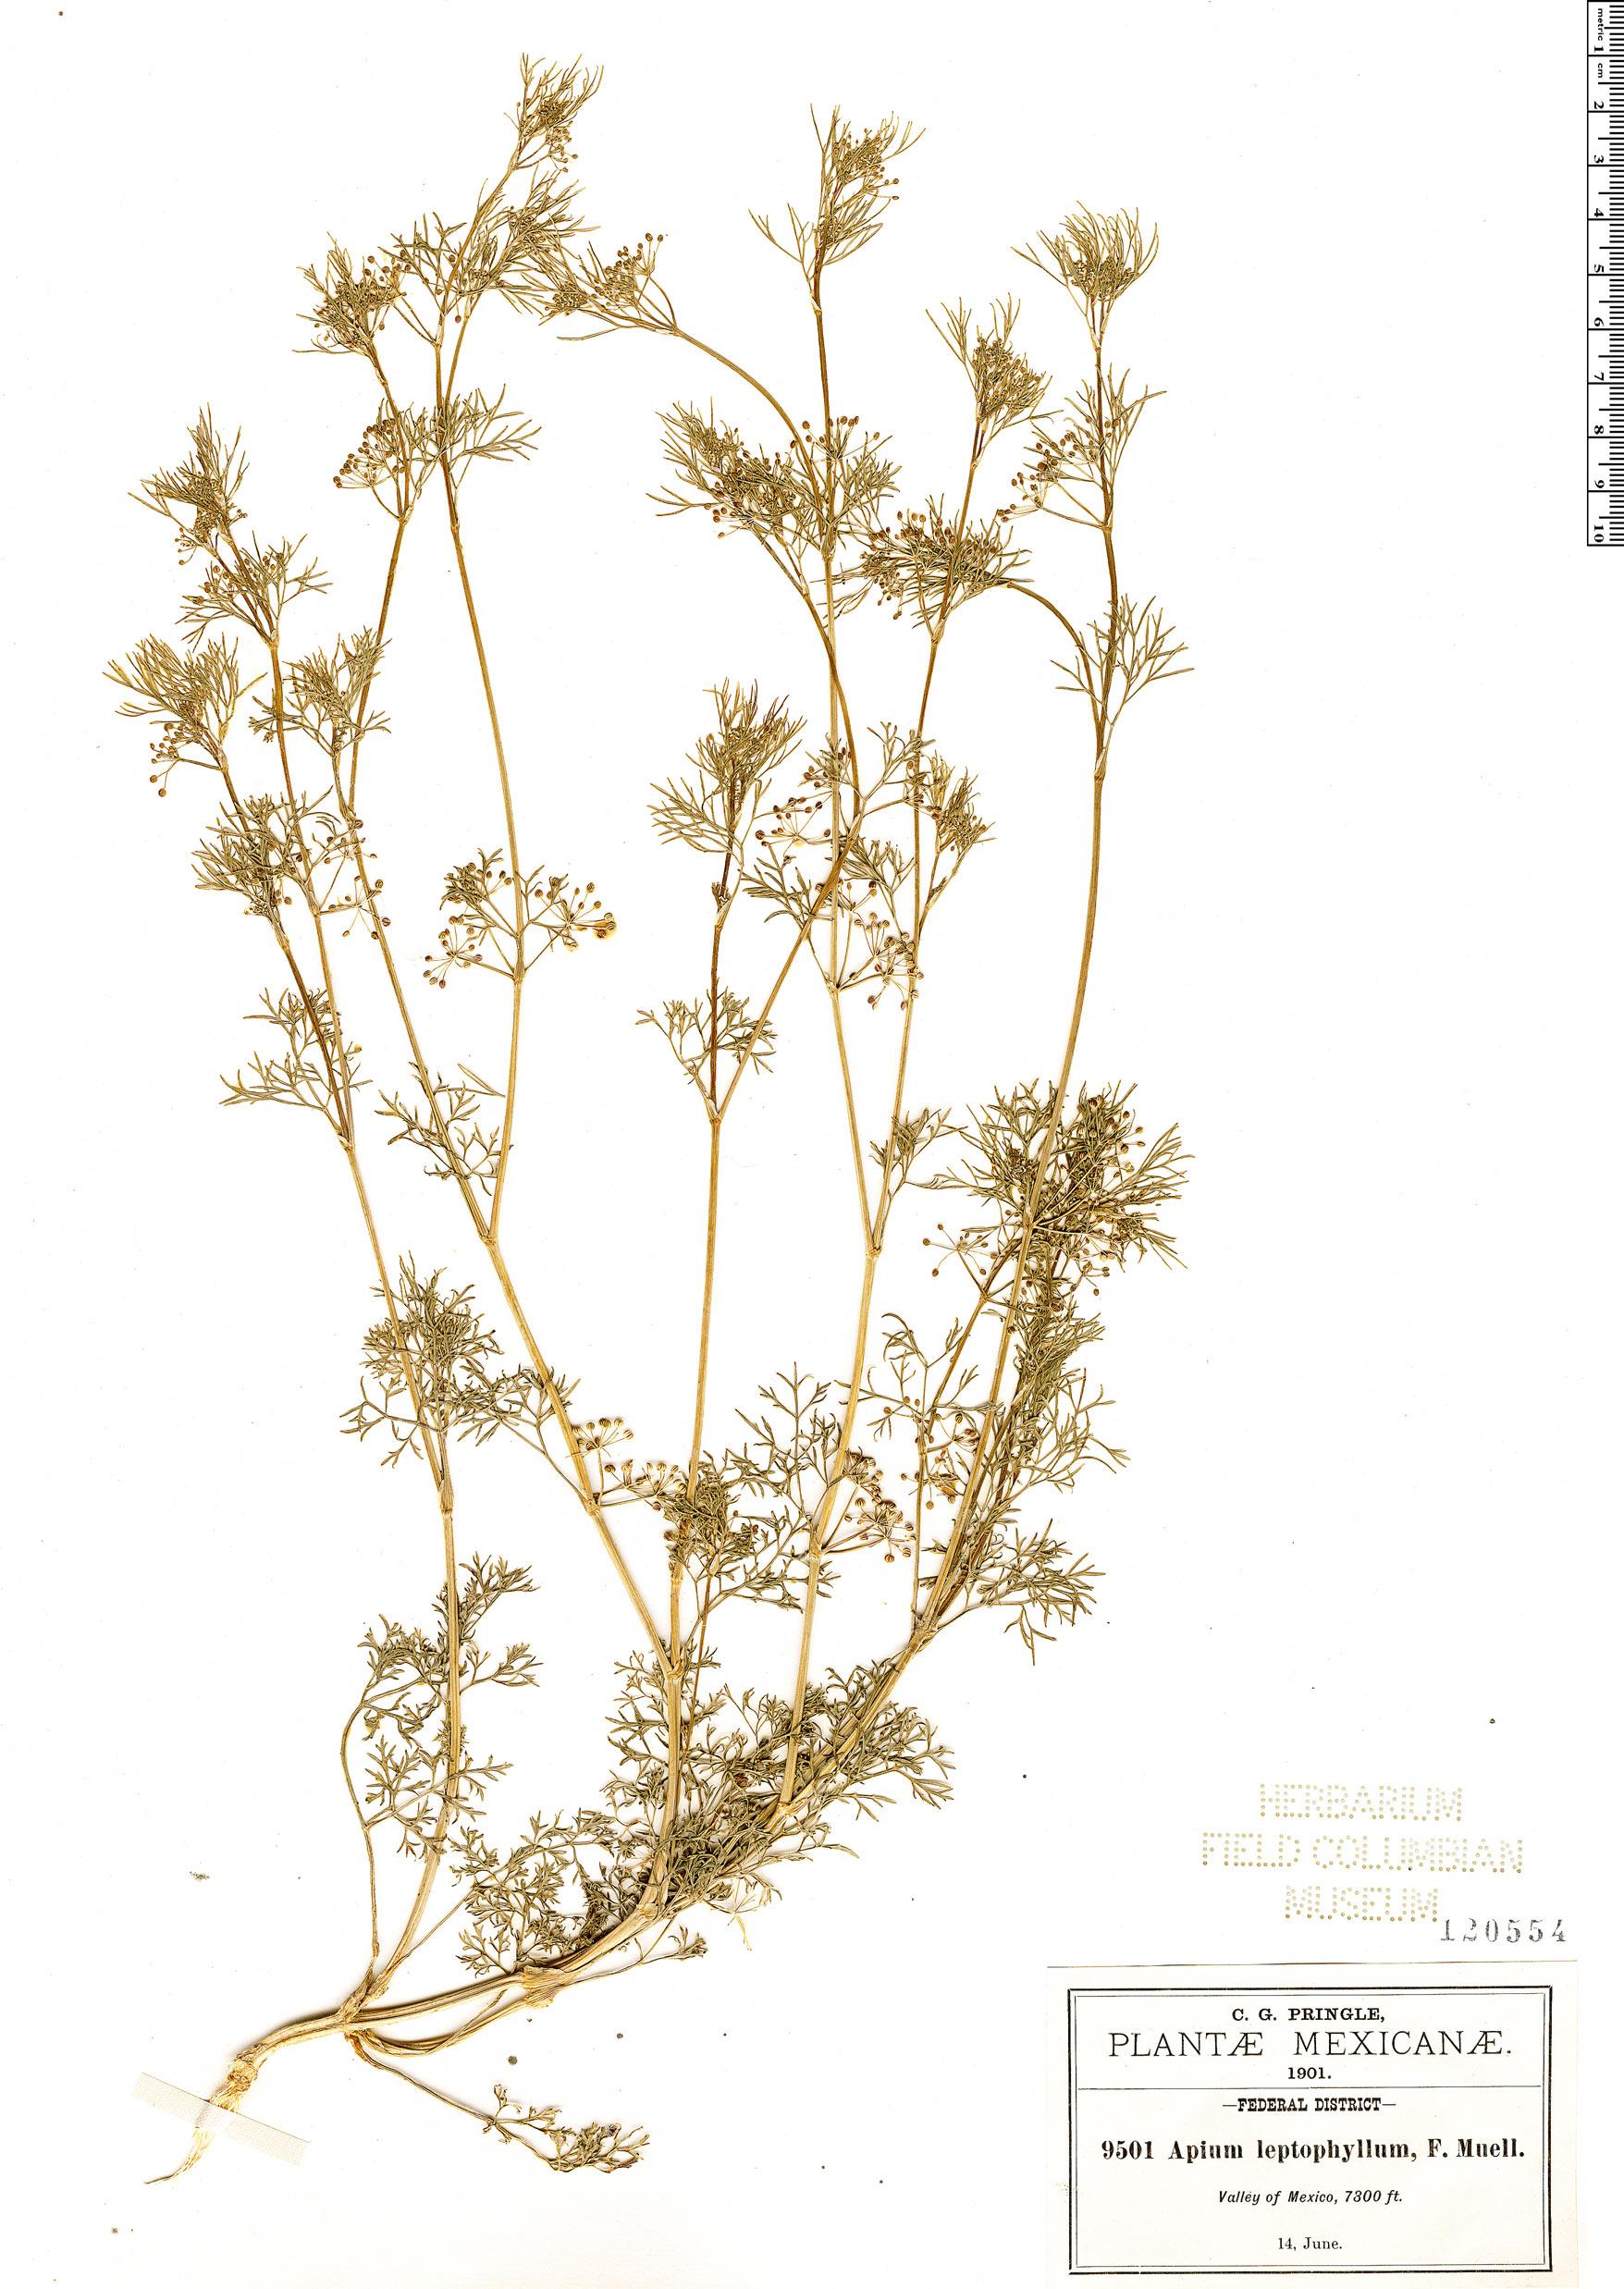 Specimen: Cyclospermum leptophyllum